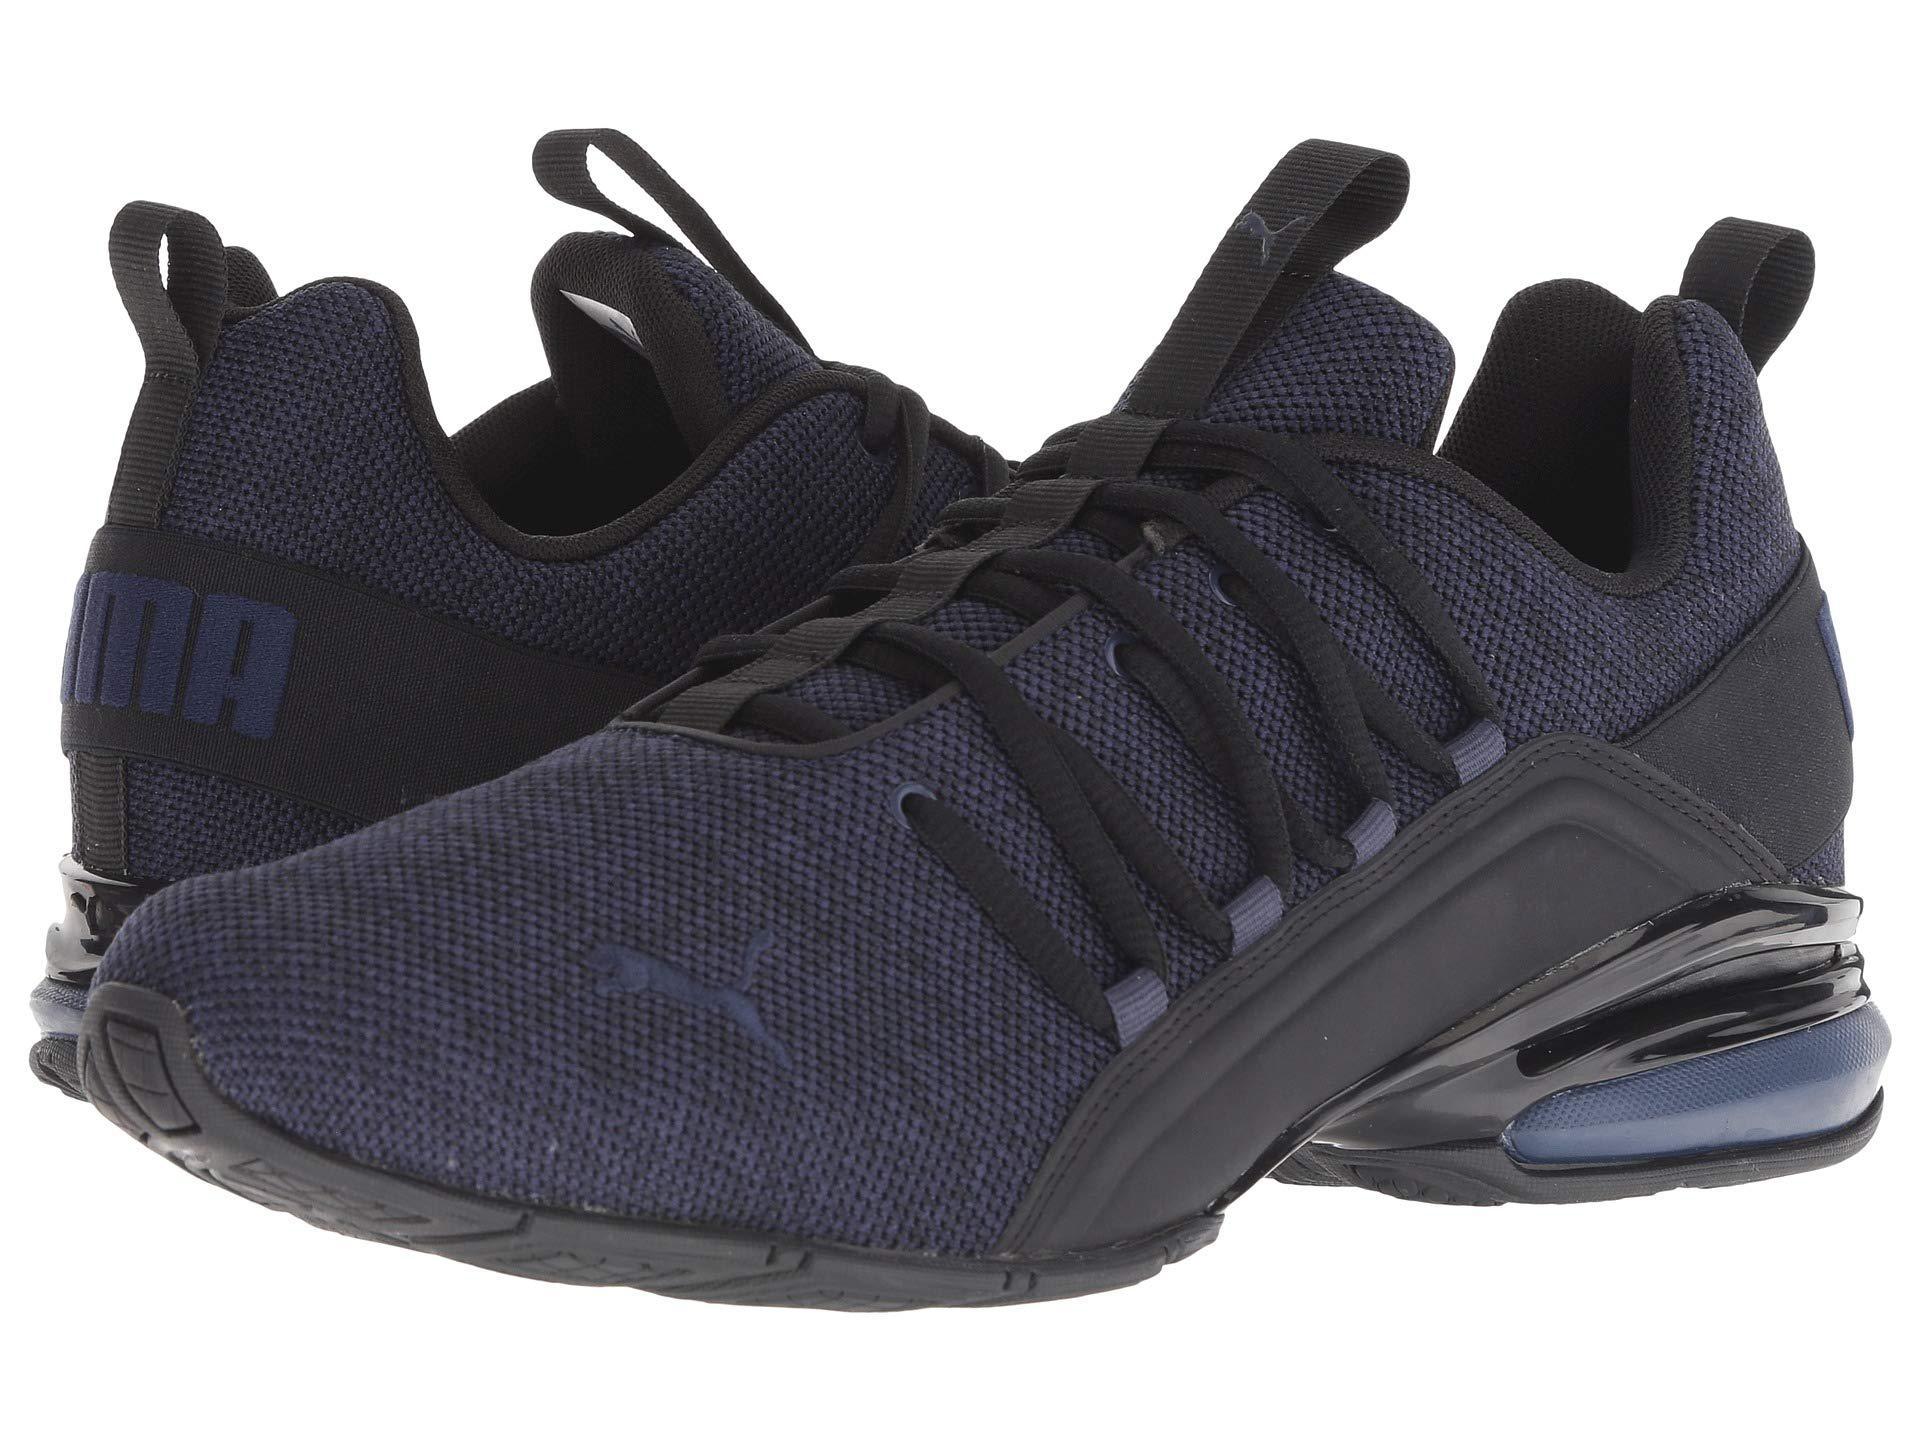 f36de506a718 ... Lyst - Puma Axelion ( Black peacoat) Men s Shoes in Black for Men buy  ...